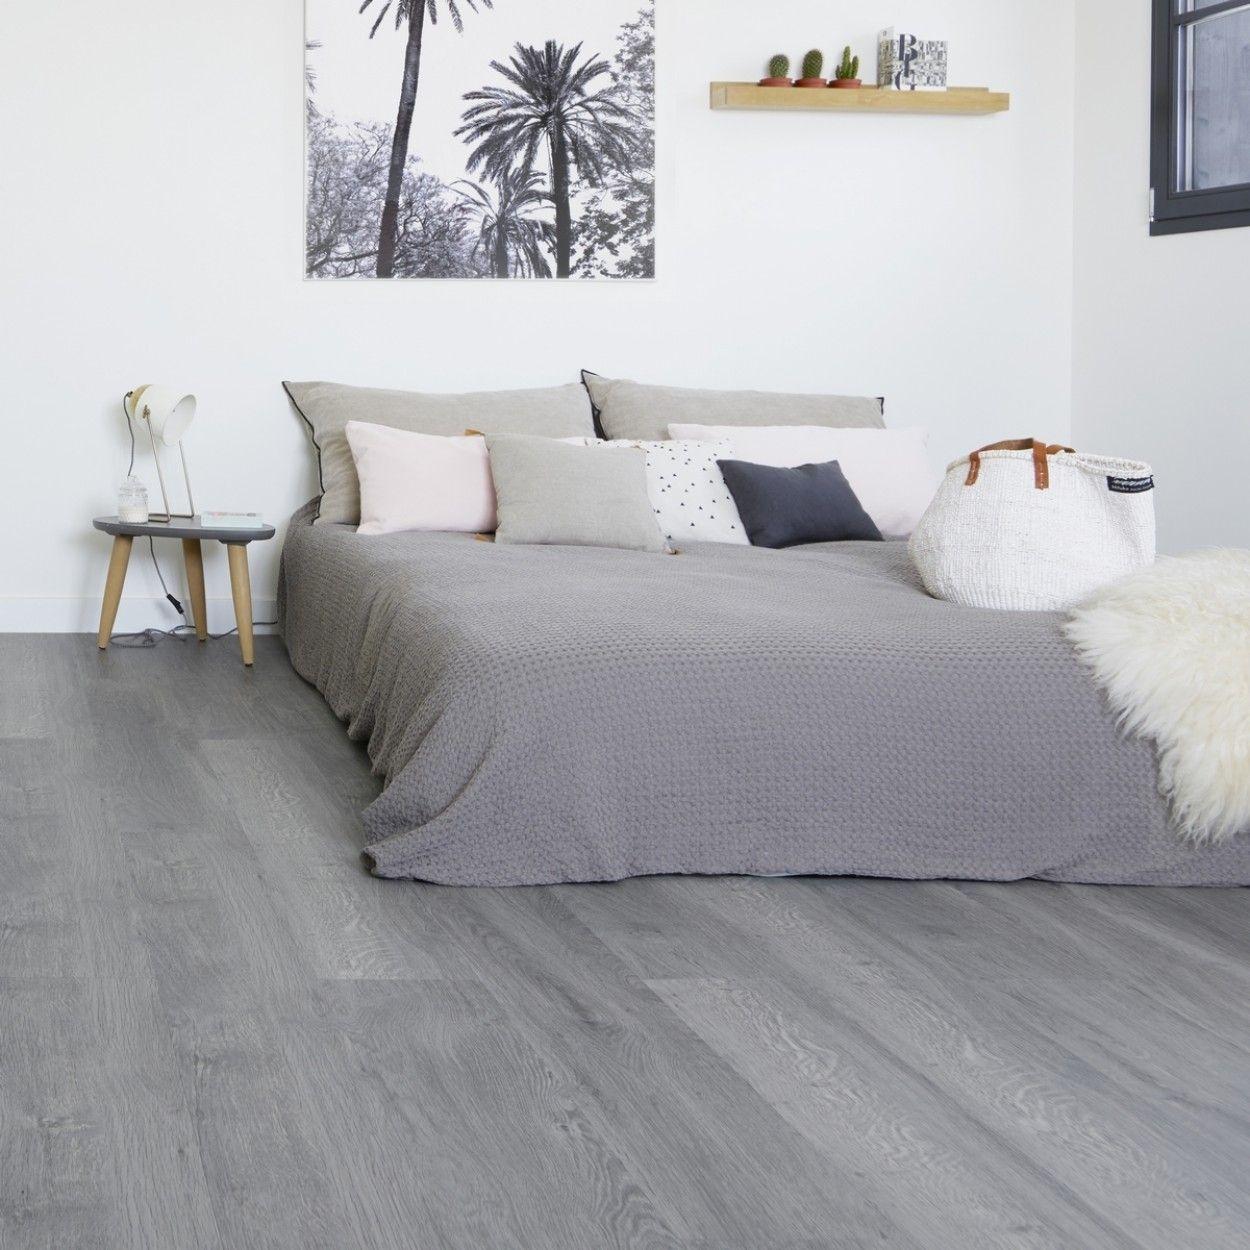 Gerflor Senso Clic Premium 0835 Cleveland Grey Idee Deco Chambre Deco Chambre Parquet Chambre